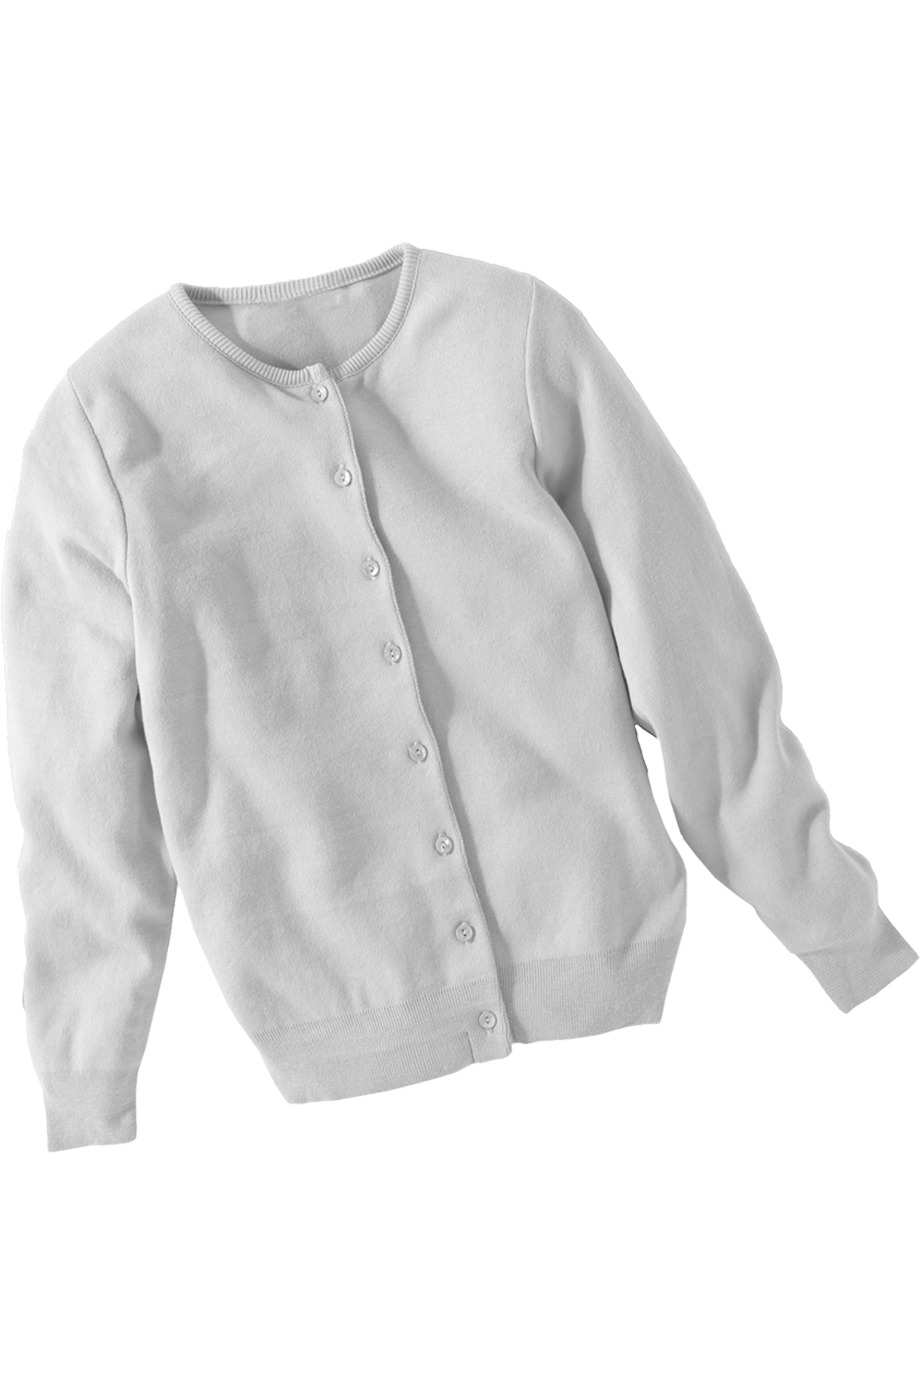 Edwards Garment 111 - Women's Cotton Cashmere Cardigan Jewel Neck